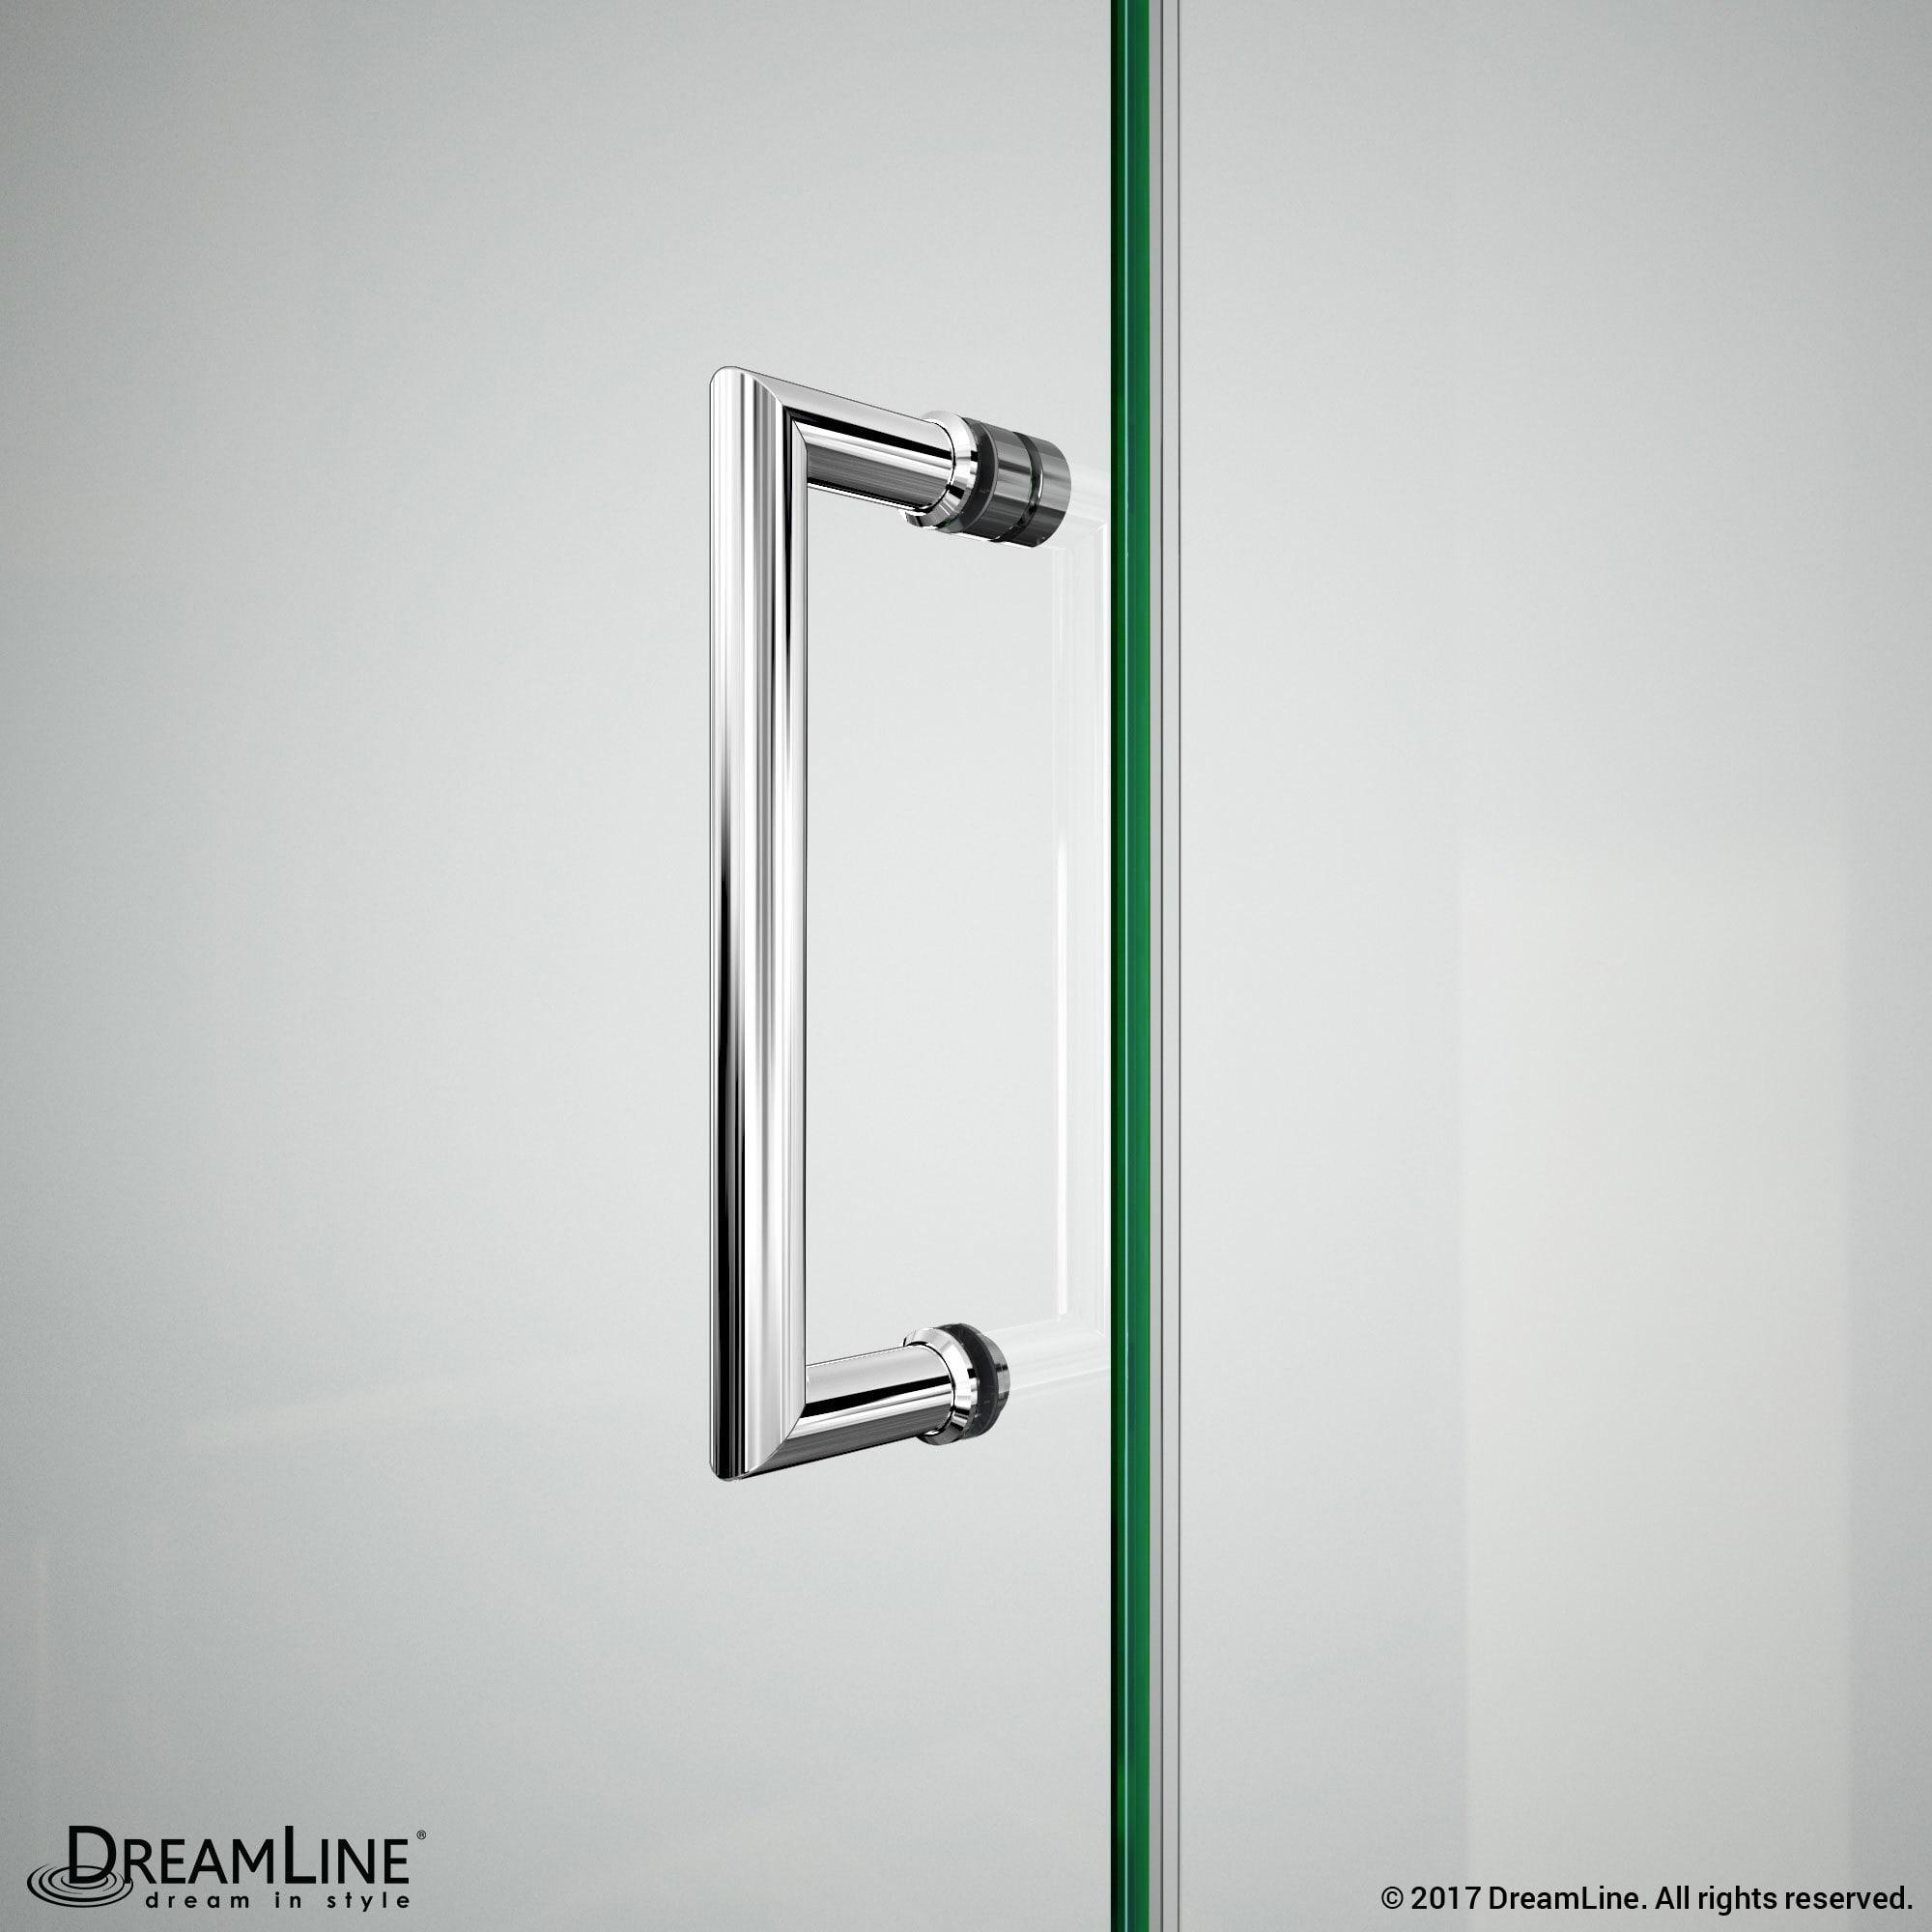 enclosure shower door doors for screens frameless panel hardware glass handles sliding angle half neo bath bathtub